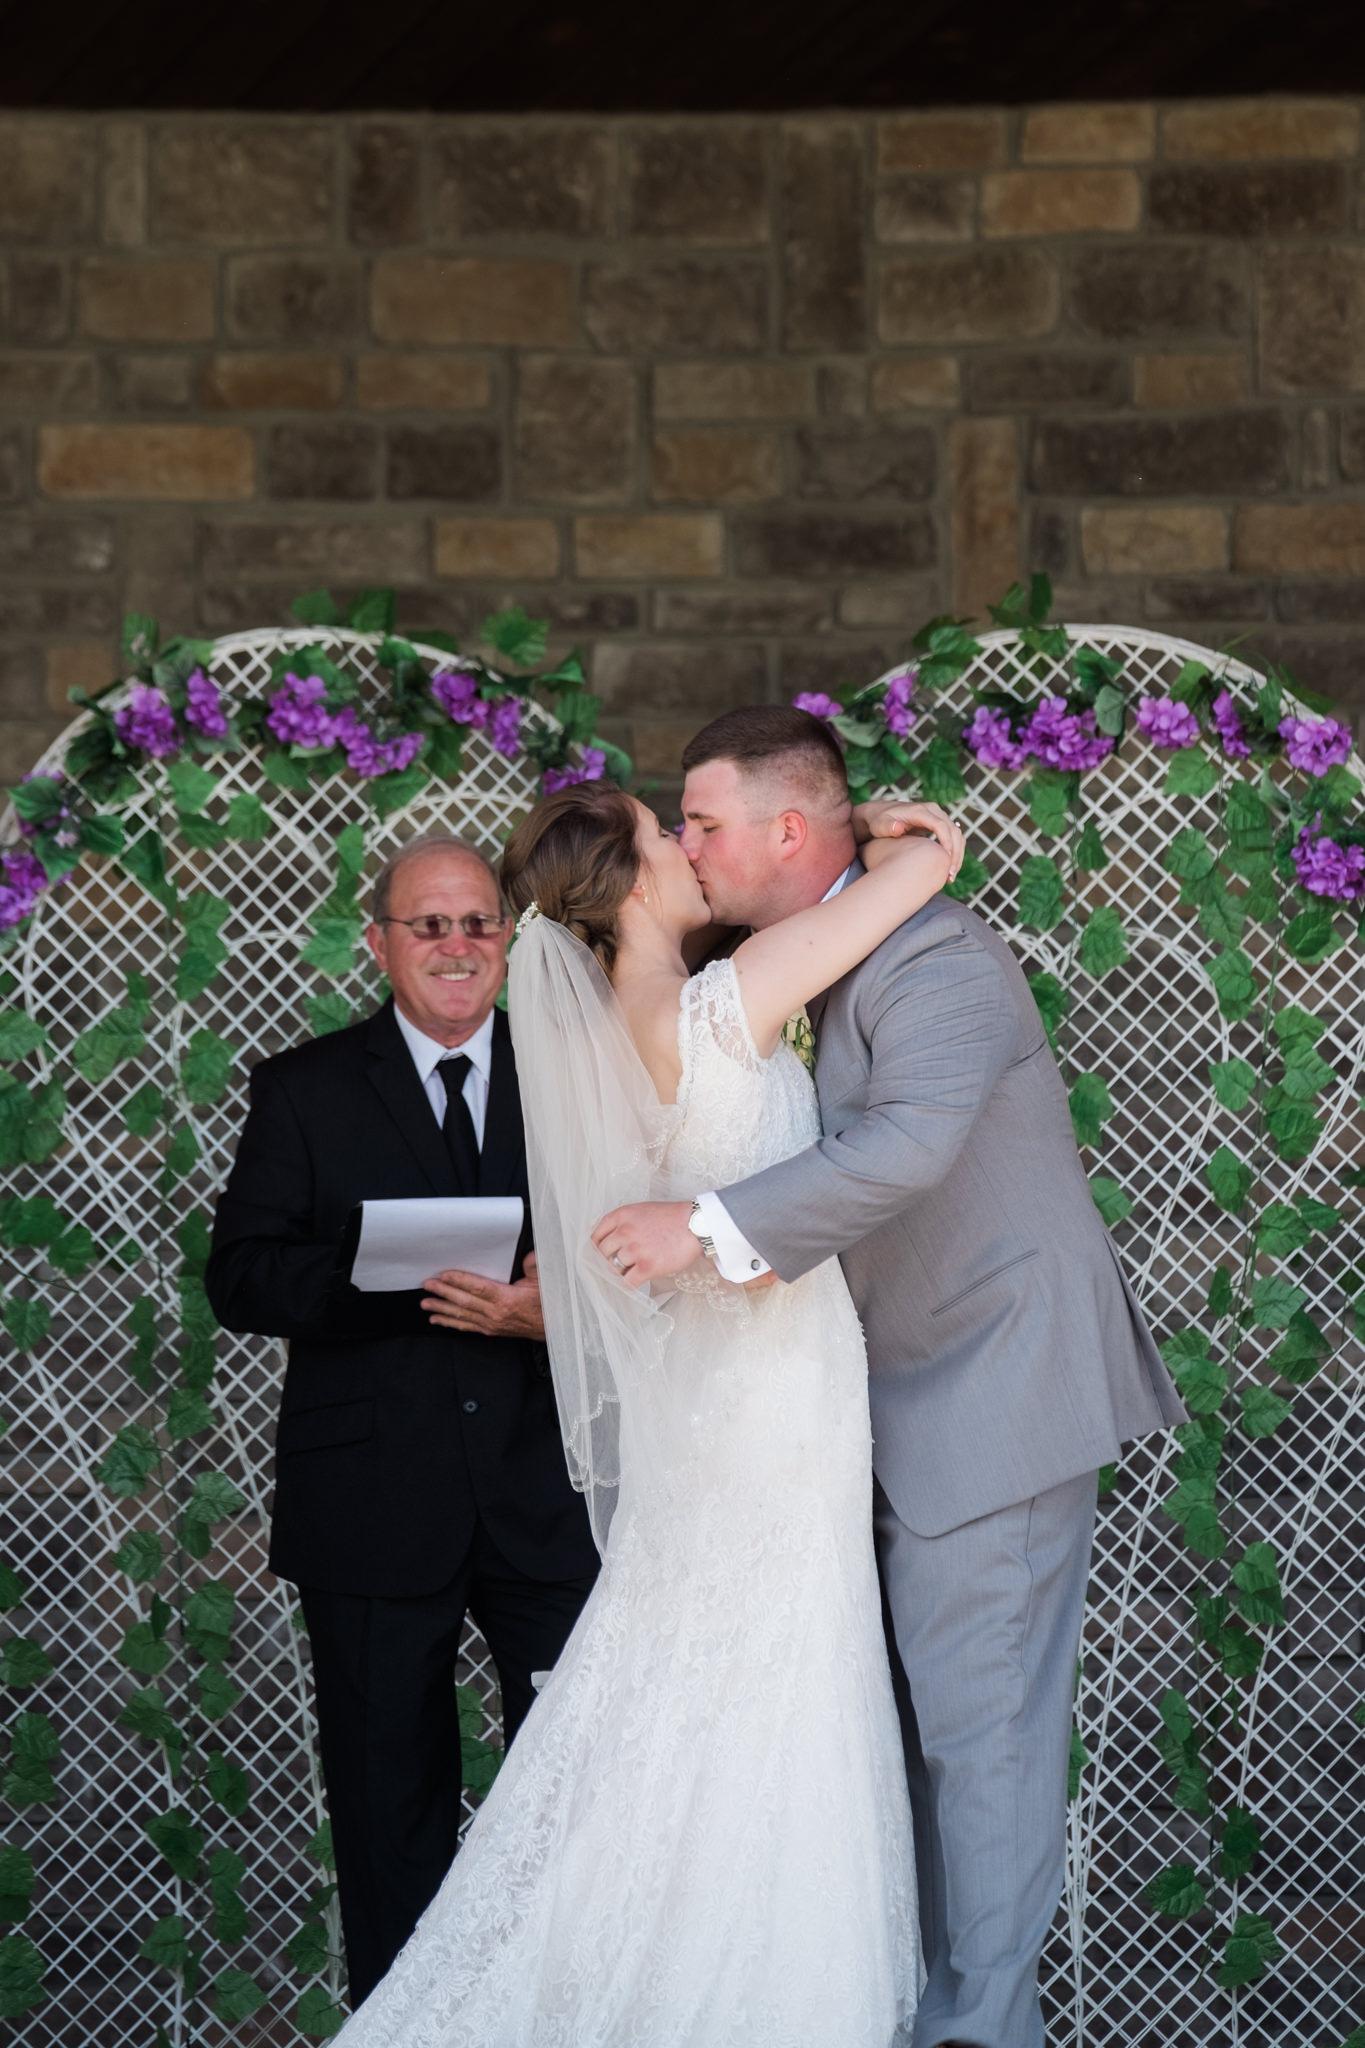 2017.06.03_Callie&Dustin_Wedding_Blog_0023.jpg